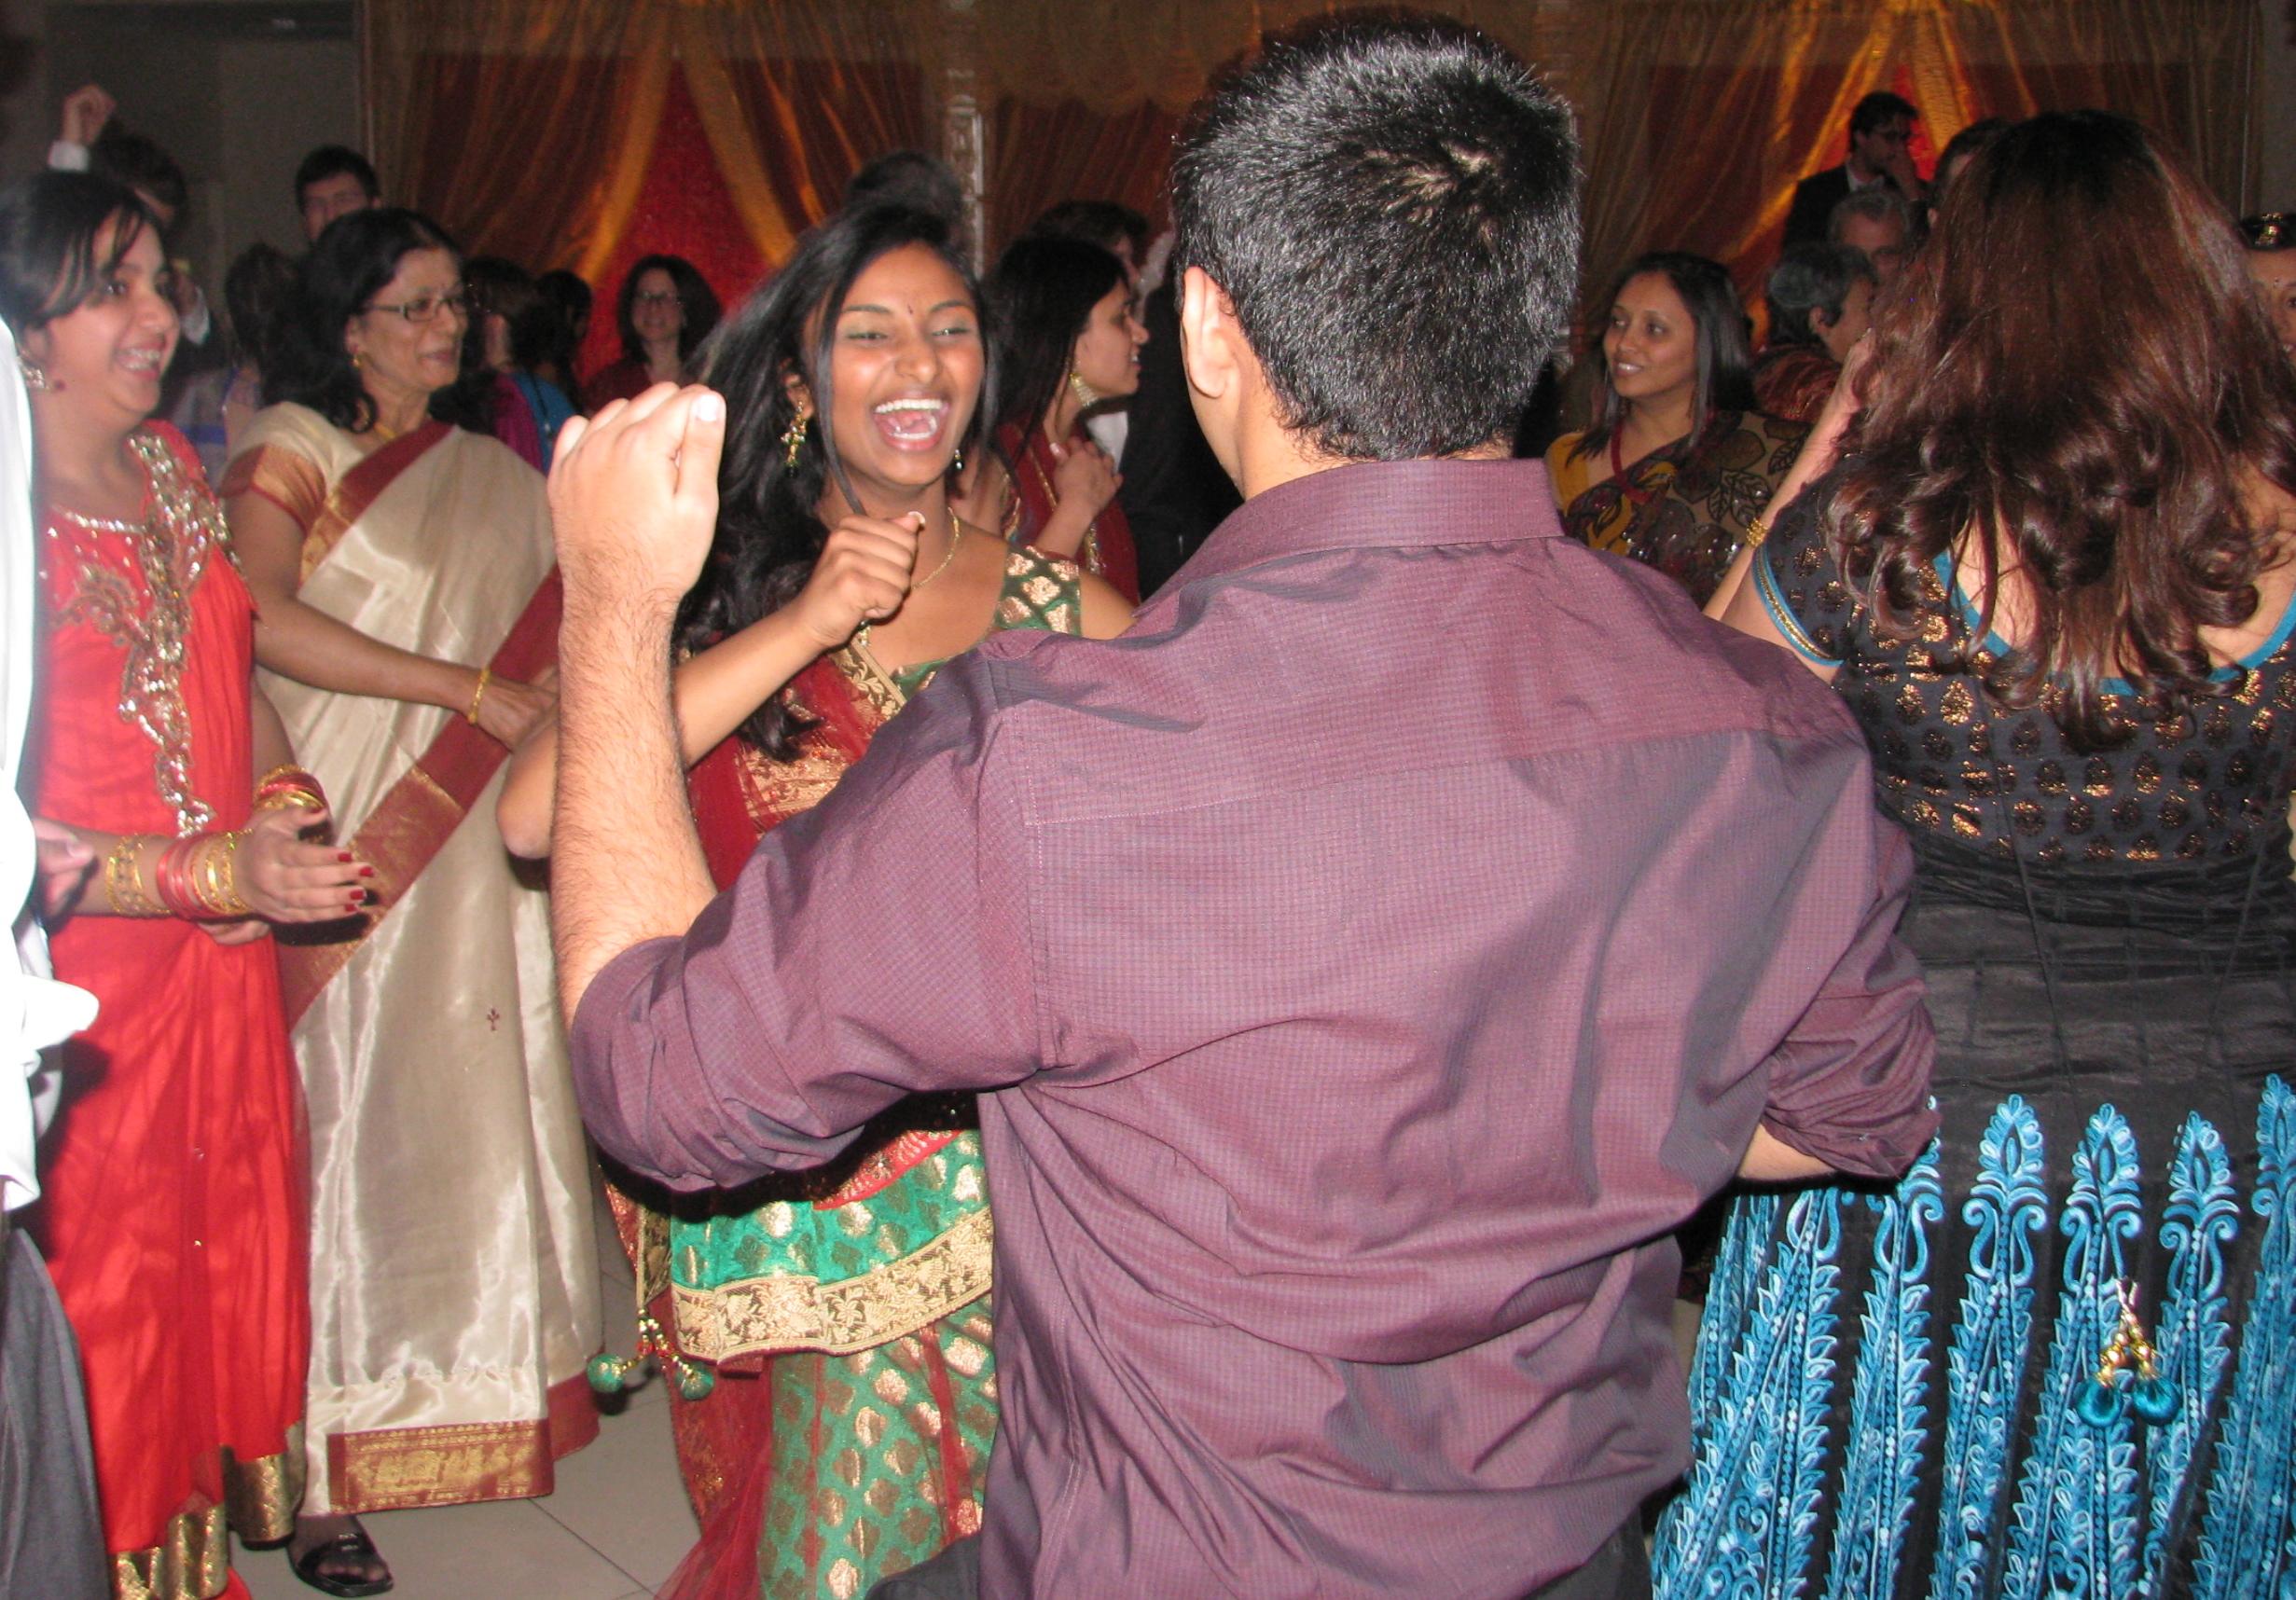 Fun Professional Wedding DJ - Fun Rhode Island Wedding DJFun Rhode ...